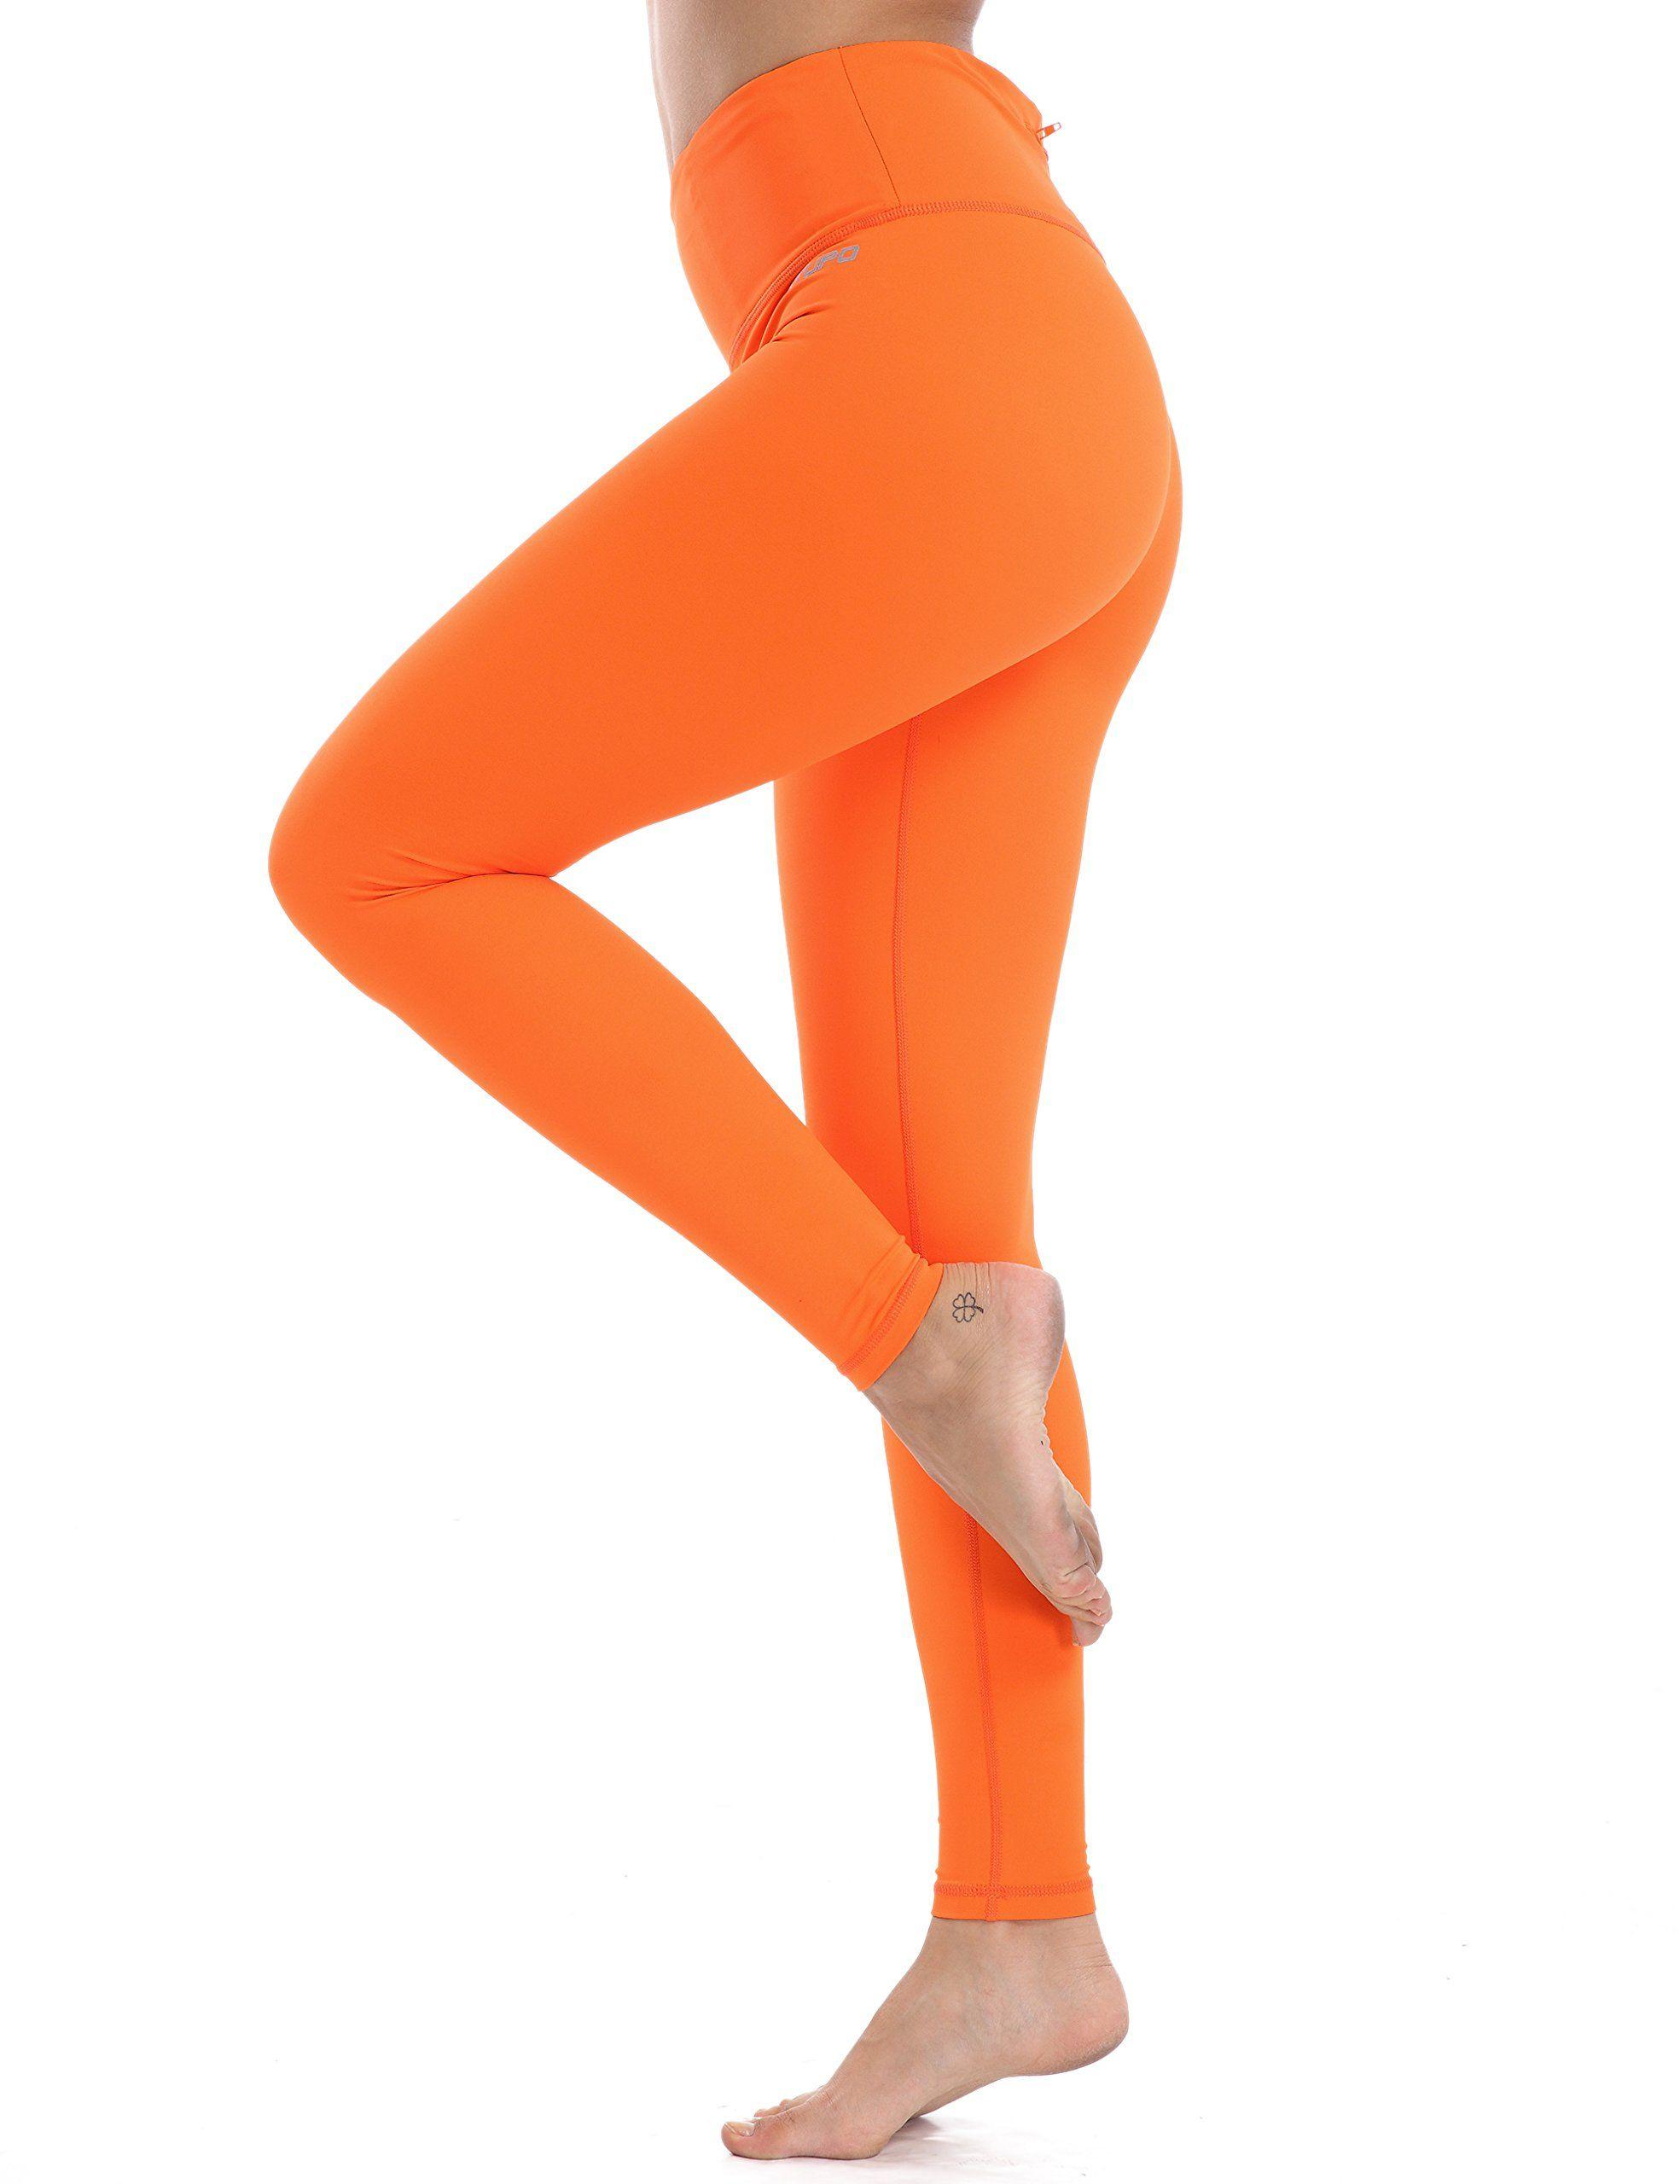 TAIBID Womens High Waist Yoga Pants Side Pockets Flare Workout Bootleg Leggings Size S XXL